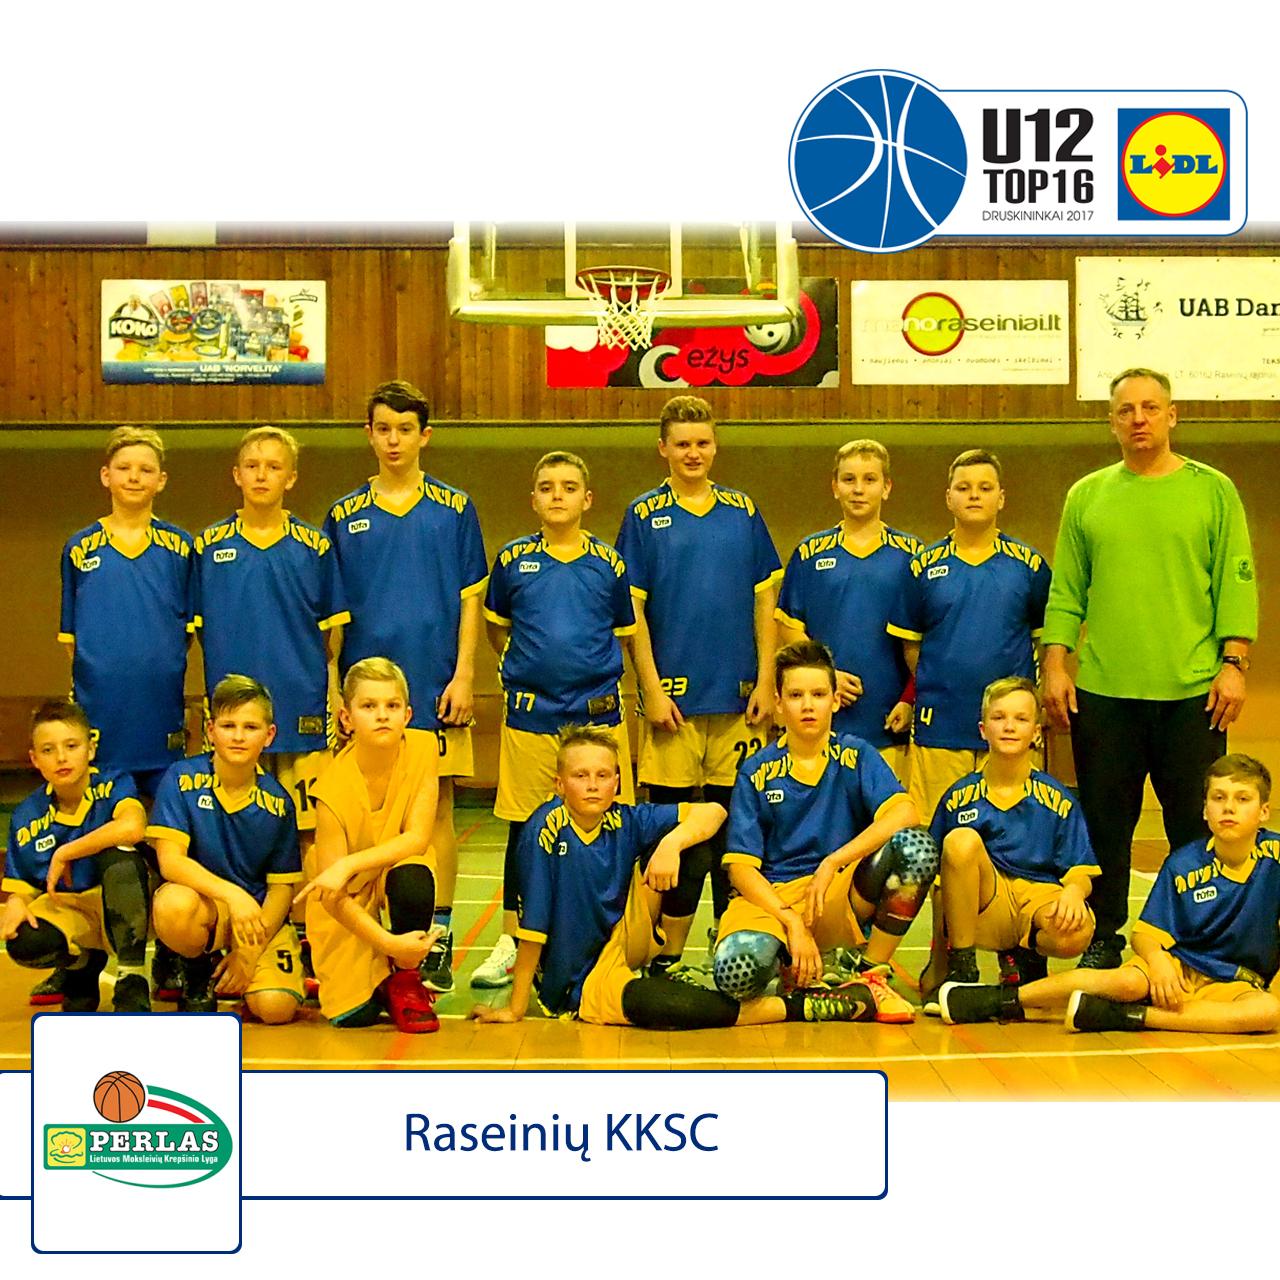 MKL_U12_Raseiniu_KKSC_paruosta